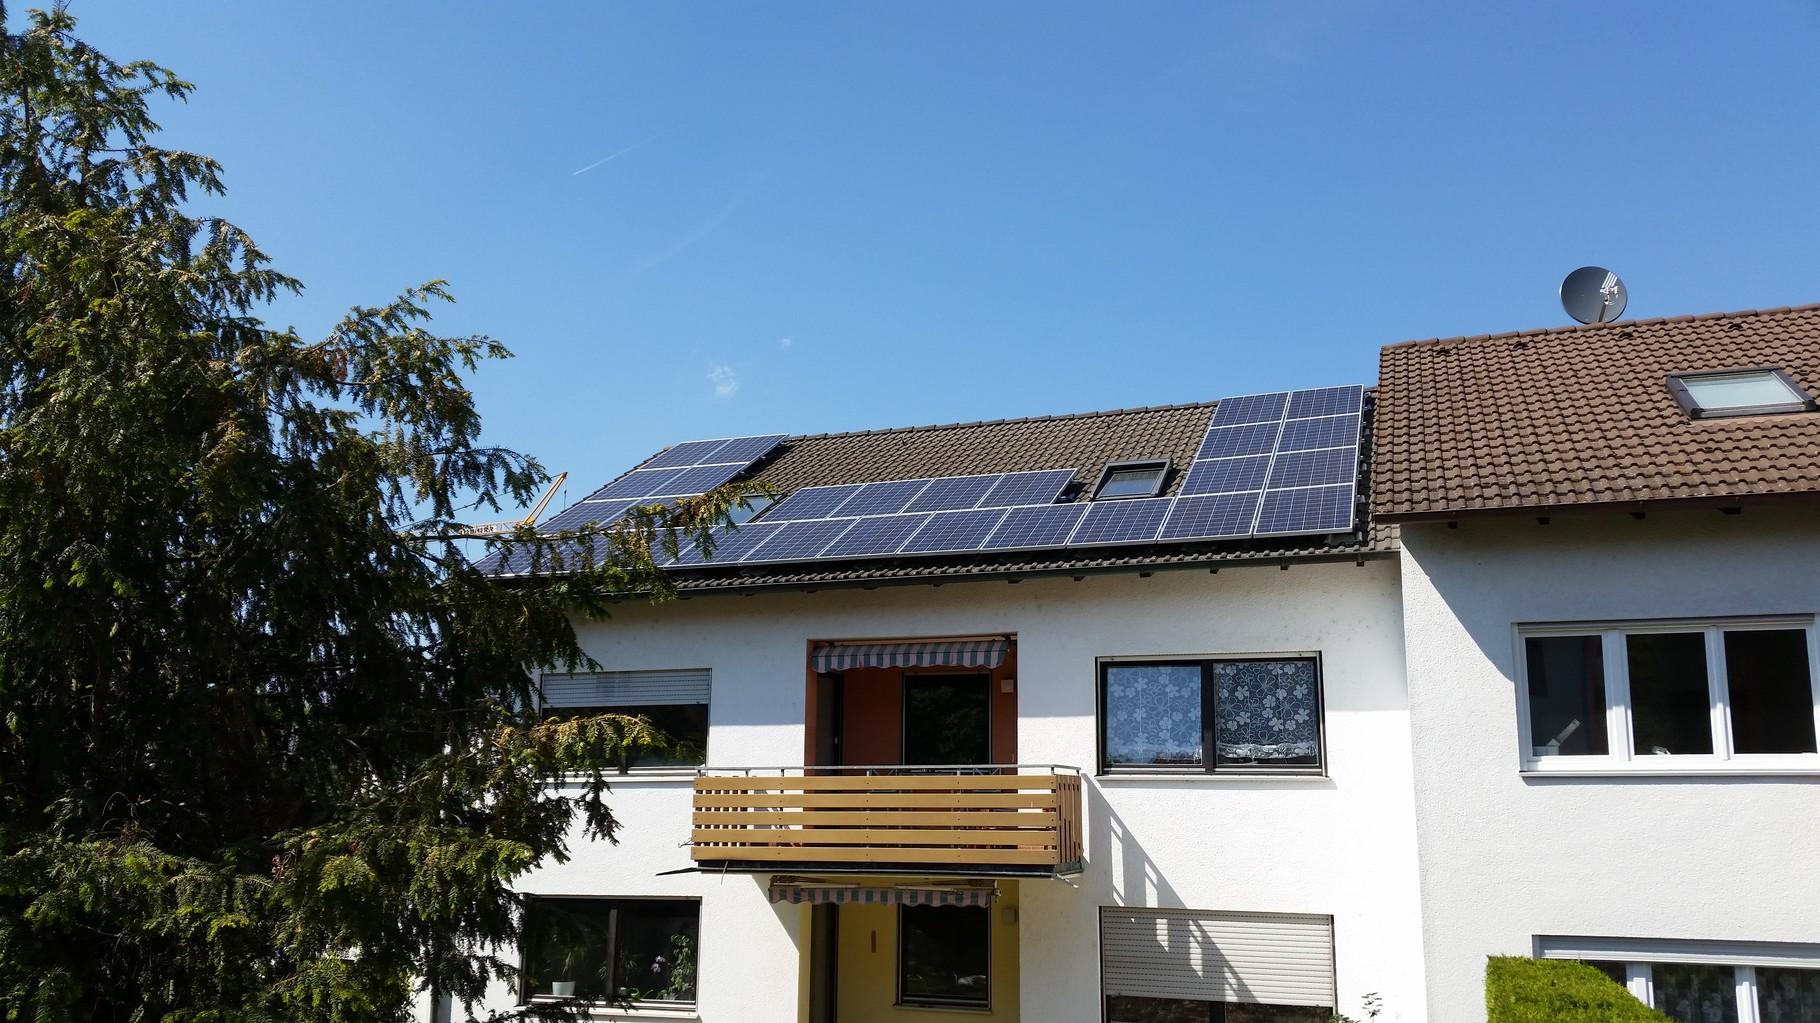 7 kWp Photovoltaikanlage 93077 Bad Abbach SHARP Modulen